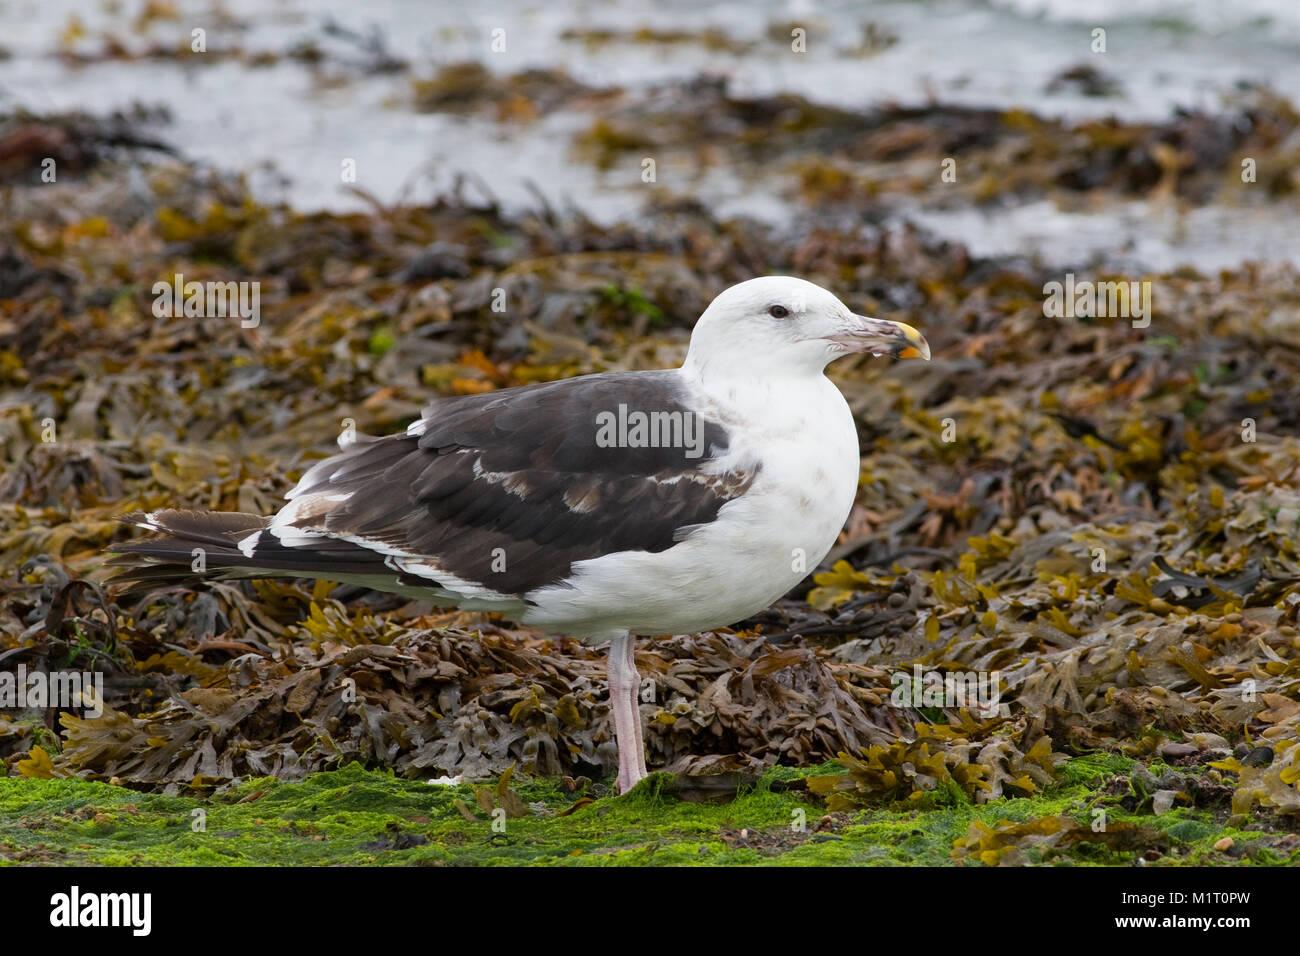 Lesser Black-backed Gull, adult, Larus fuscus, in the UK - Stock Image